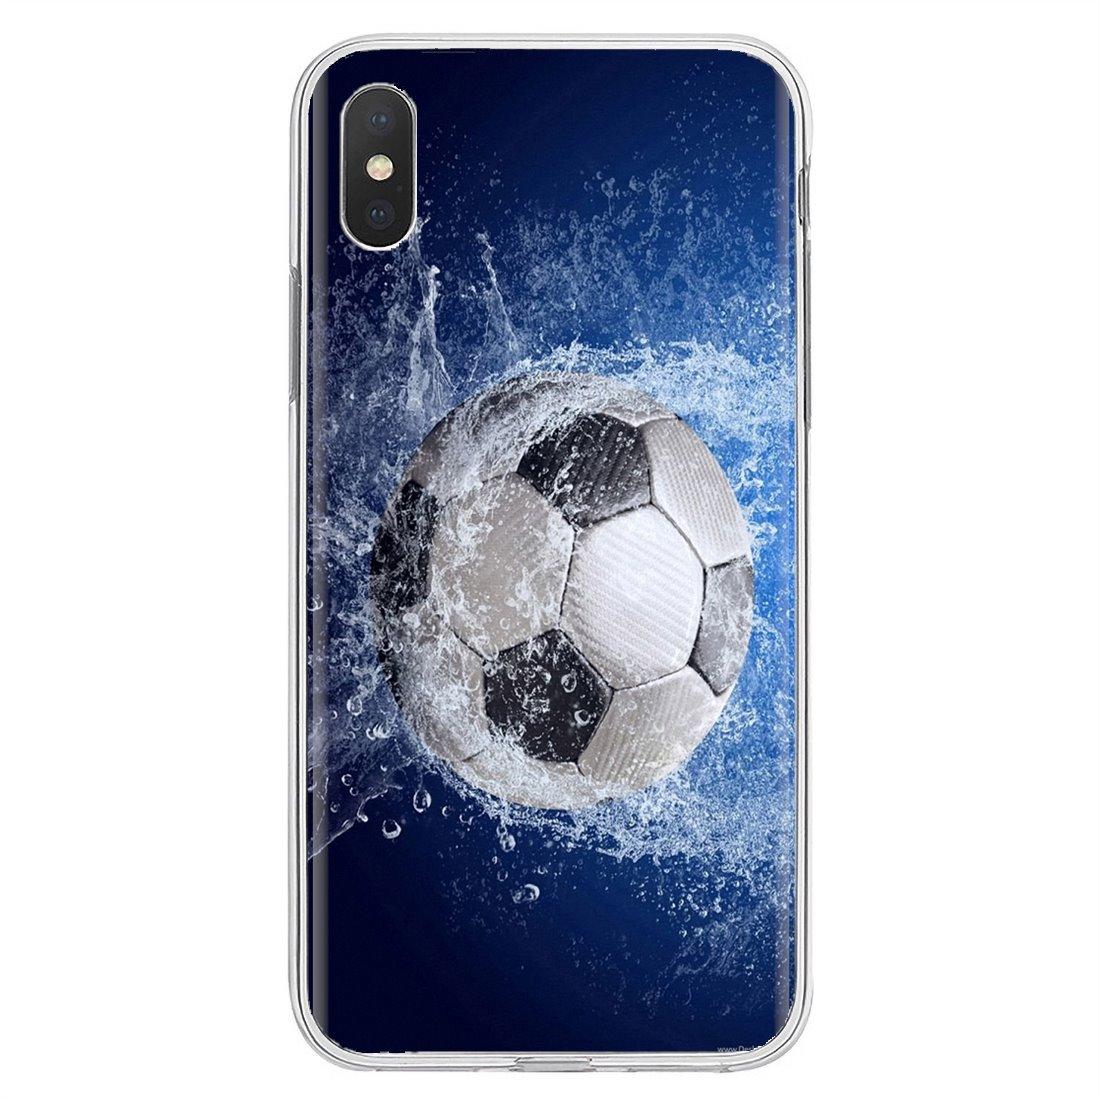 Inspirational Silicone Phone Case For Samsung Galaxy J1 J2 J3 J4 J5 J6 J7 J8 Plus 2018 Prime 2015 2016 2017 Football Sports